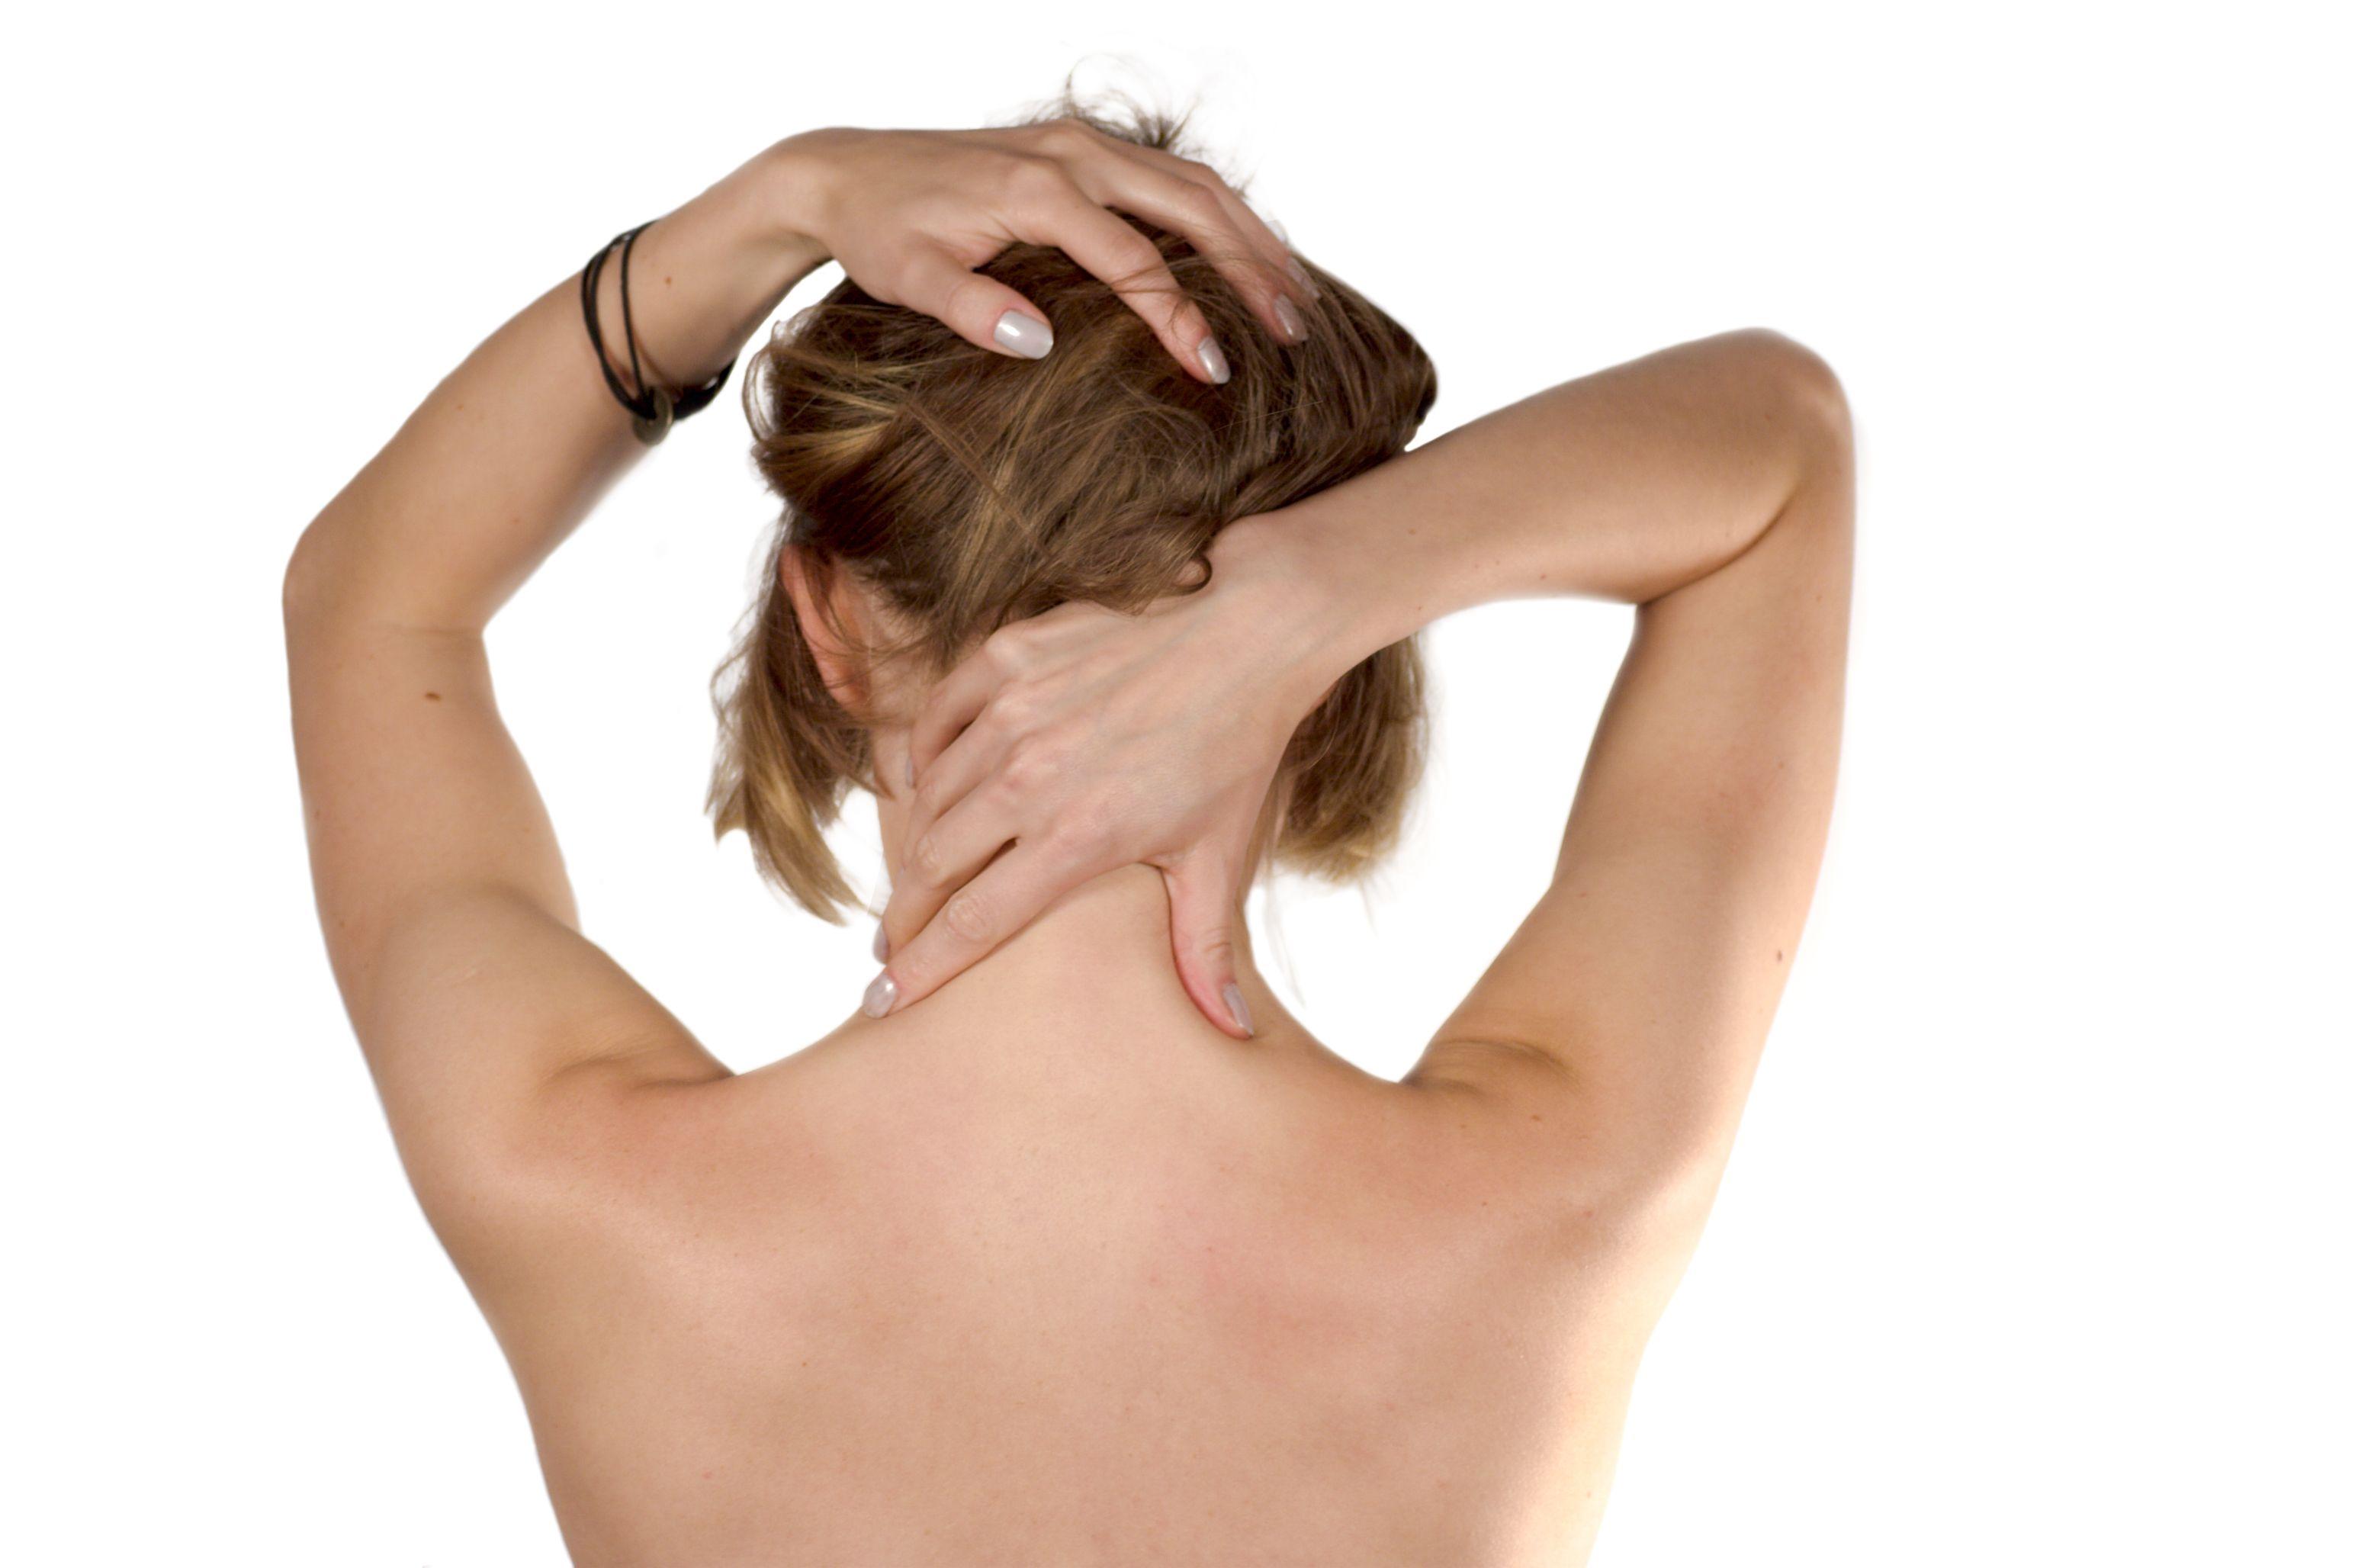 Acupressure self massage, https://www.info-on-high-blood-pressure.com/Overcome-High-Blood-Pressure.html